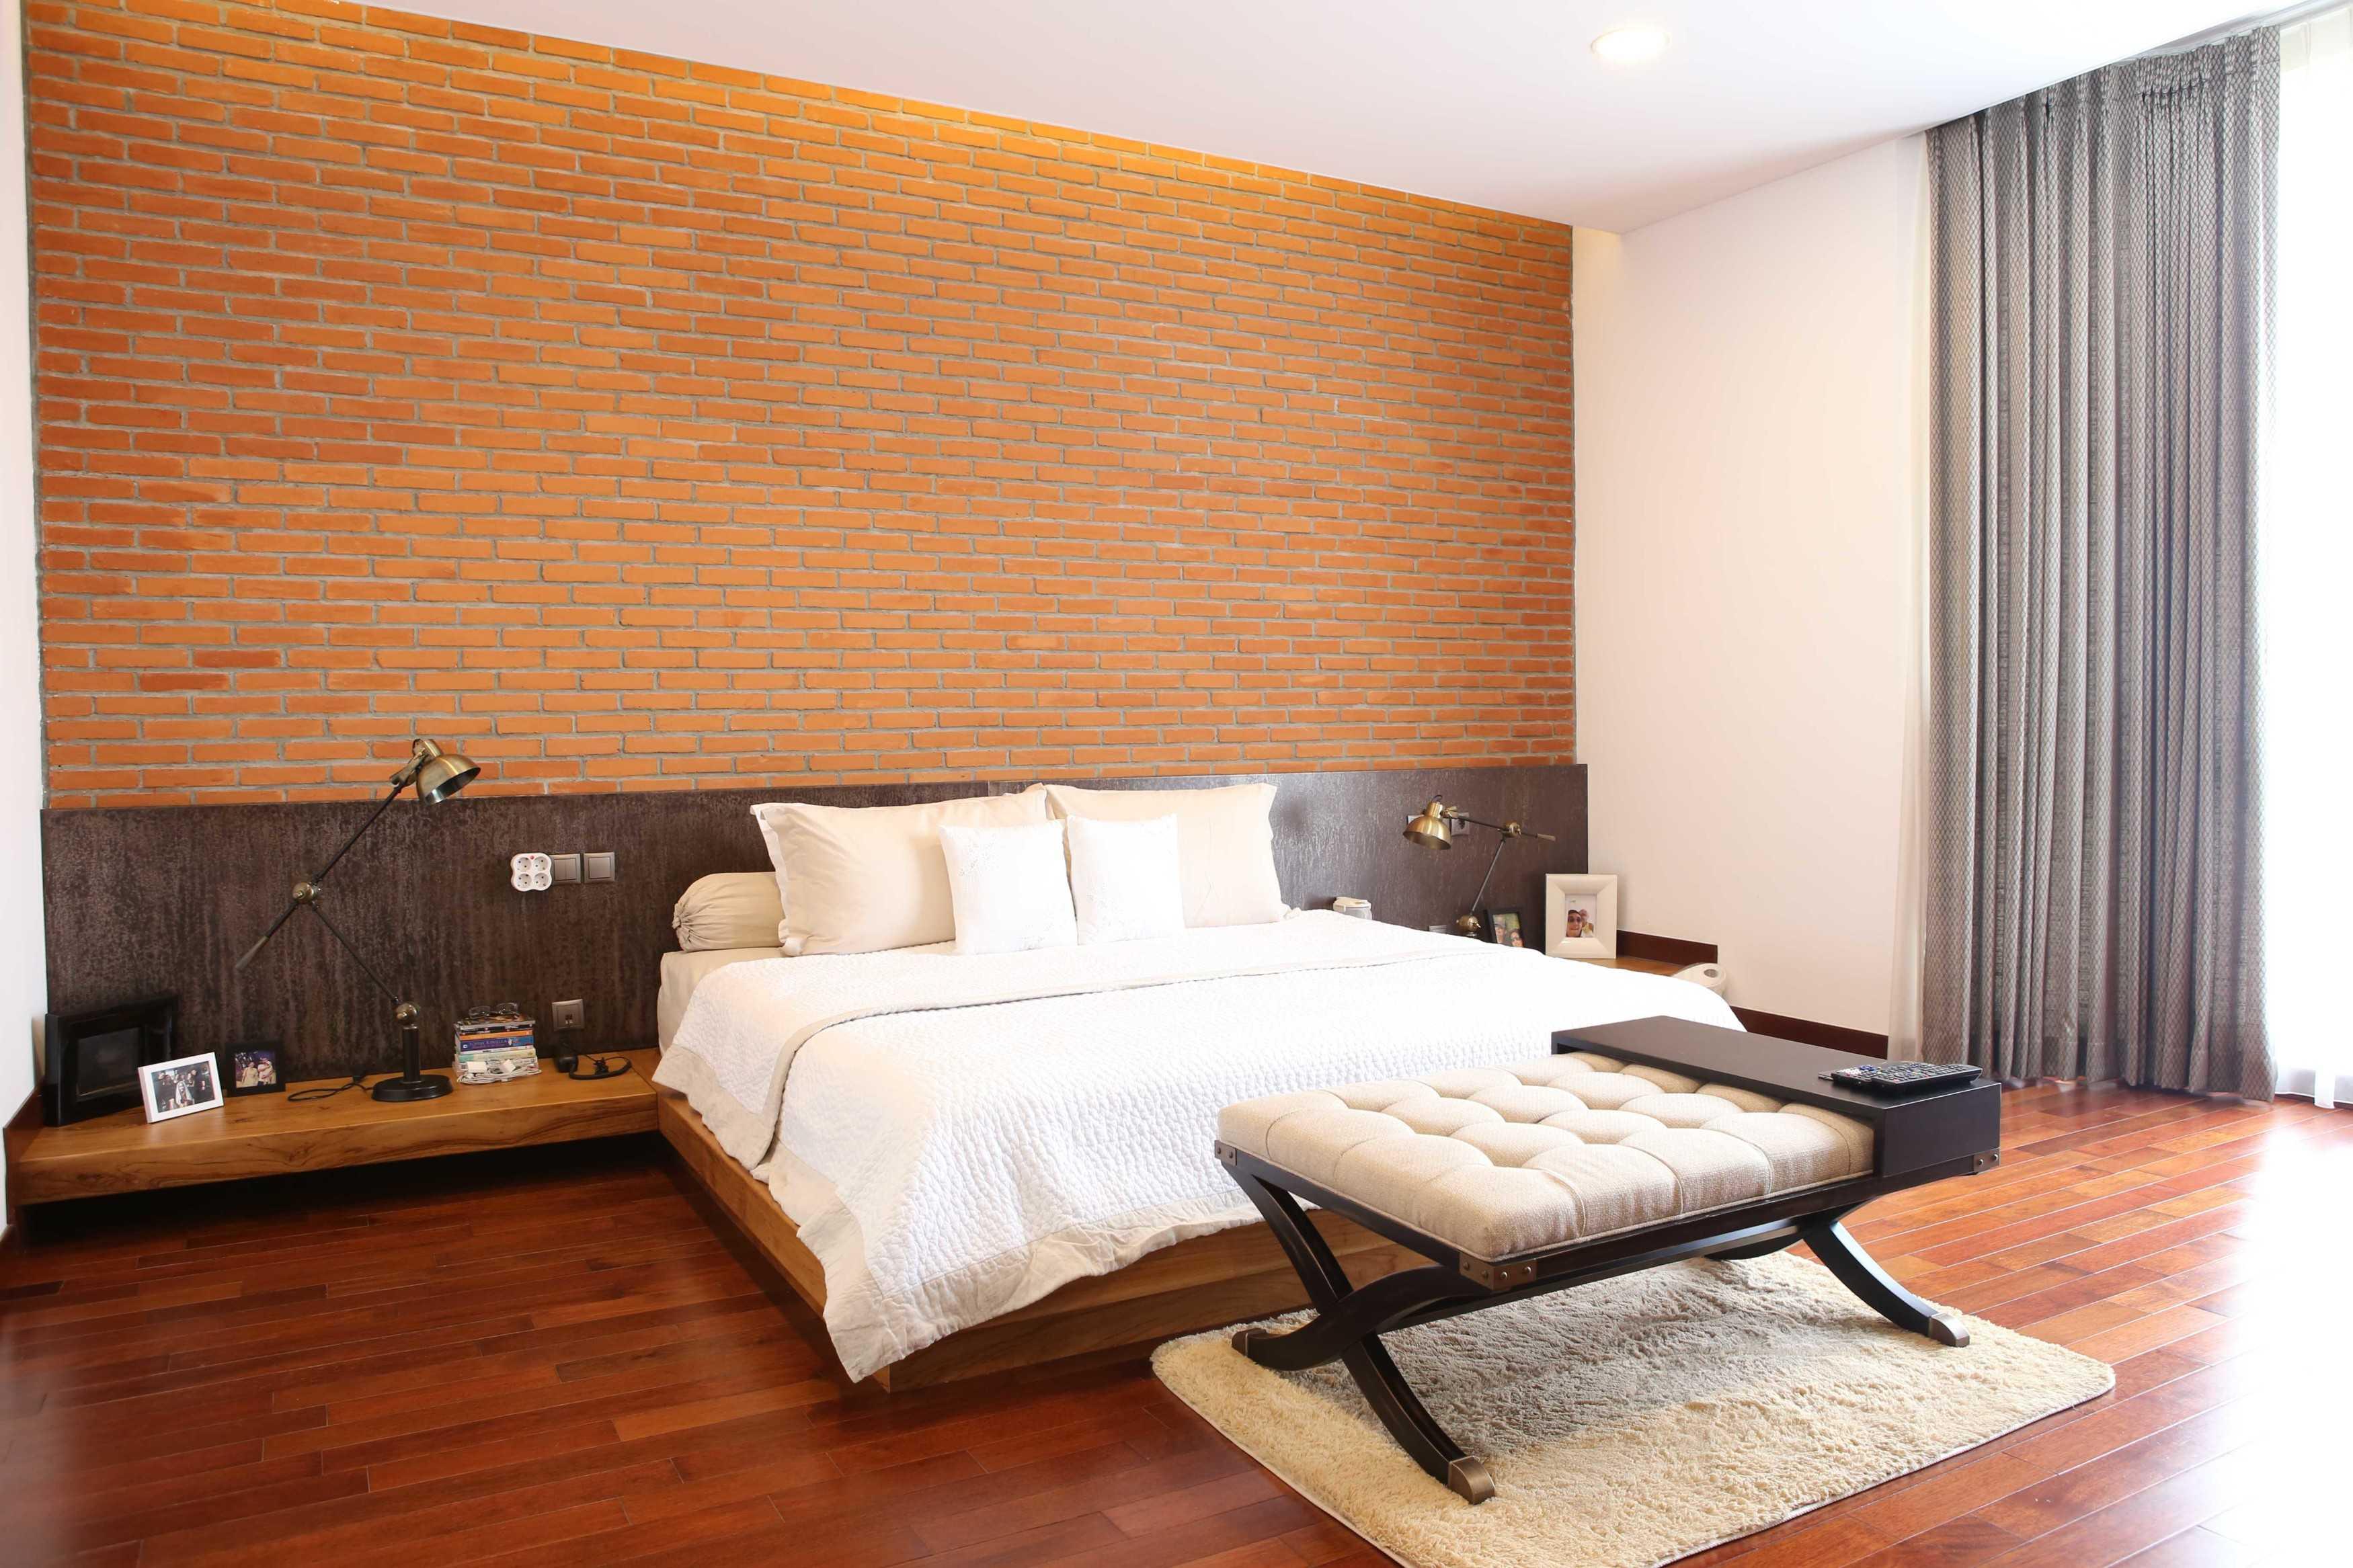 Home By Fabelio.com Dempo House Jakarta Selatan, Kota Jakarta Selatan, Daerah Khusus Ibukota Jakarta, Indonesia  Tanjung Duren's Villa Bedroom Contemporary  53291